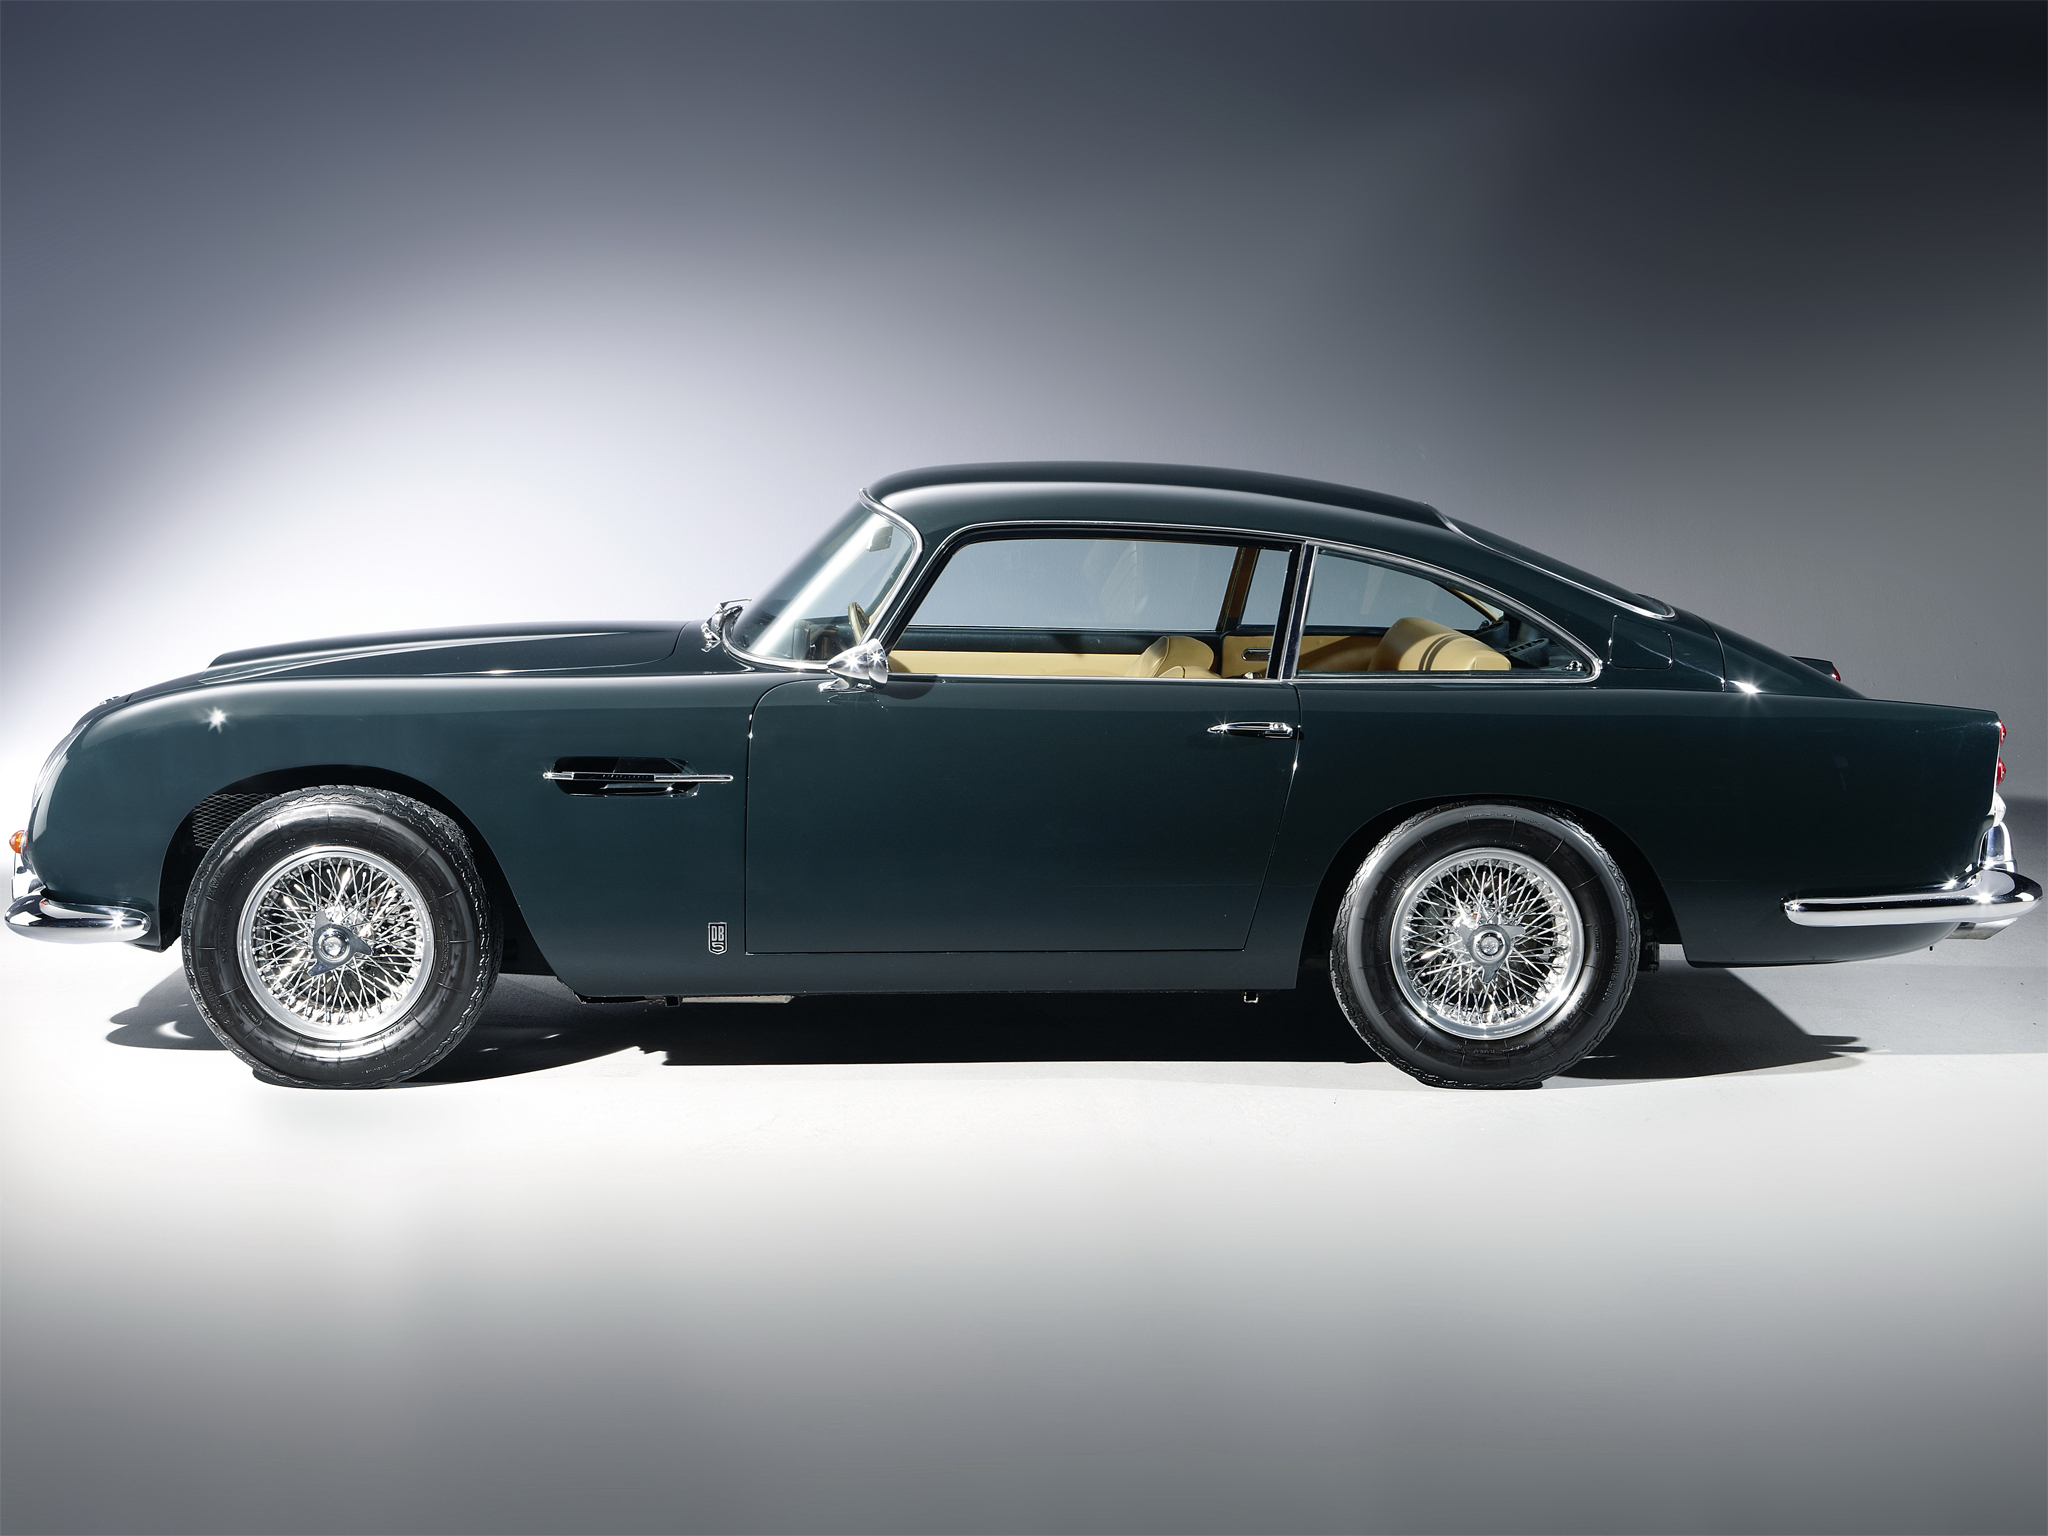 Aston Martin DB5 Vantage Wallpapers Cool Cars Wallpaper 2048x1536